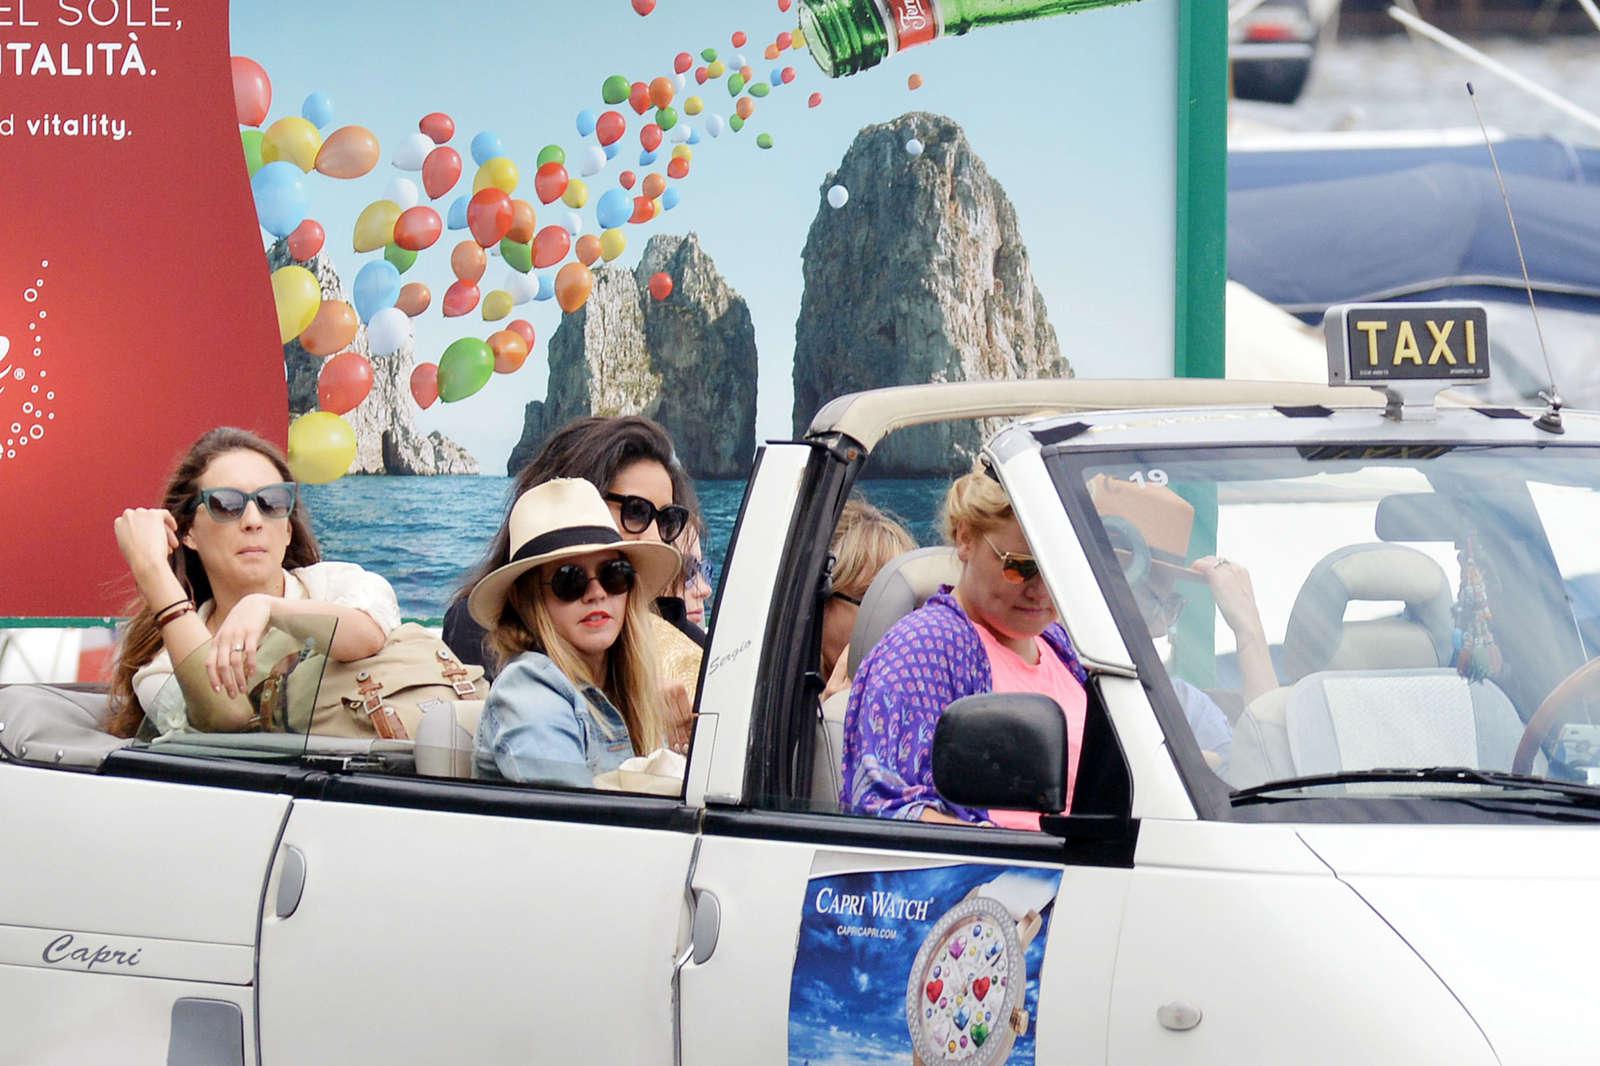 Ashley Benson 2016 : Ashley Benson, Shay Mitchell and Troian Bellisario on a boat in Capri -28